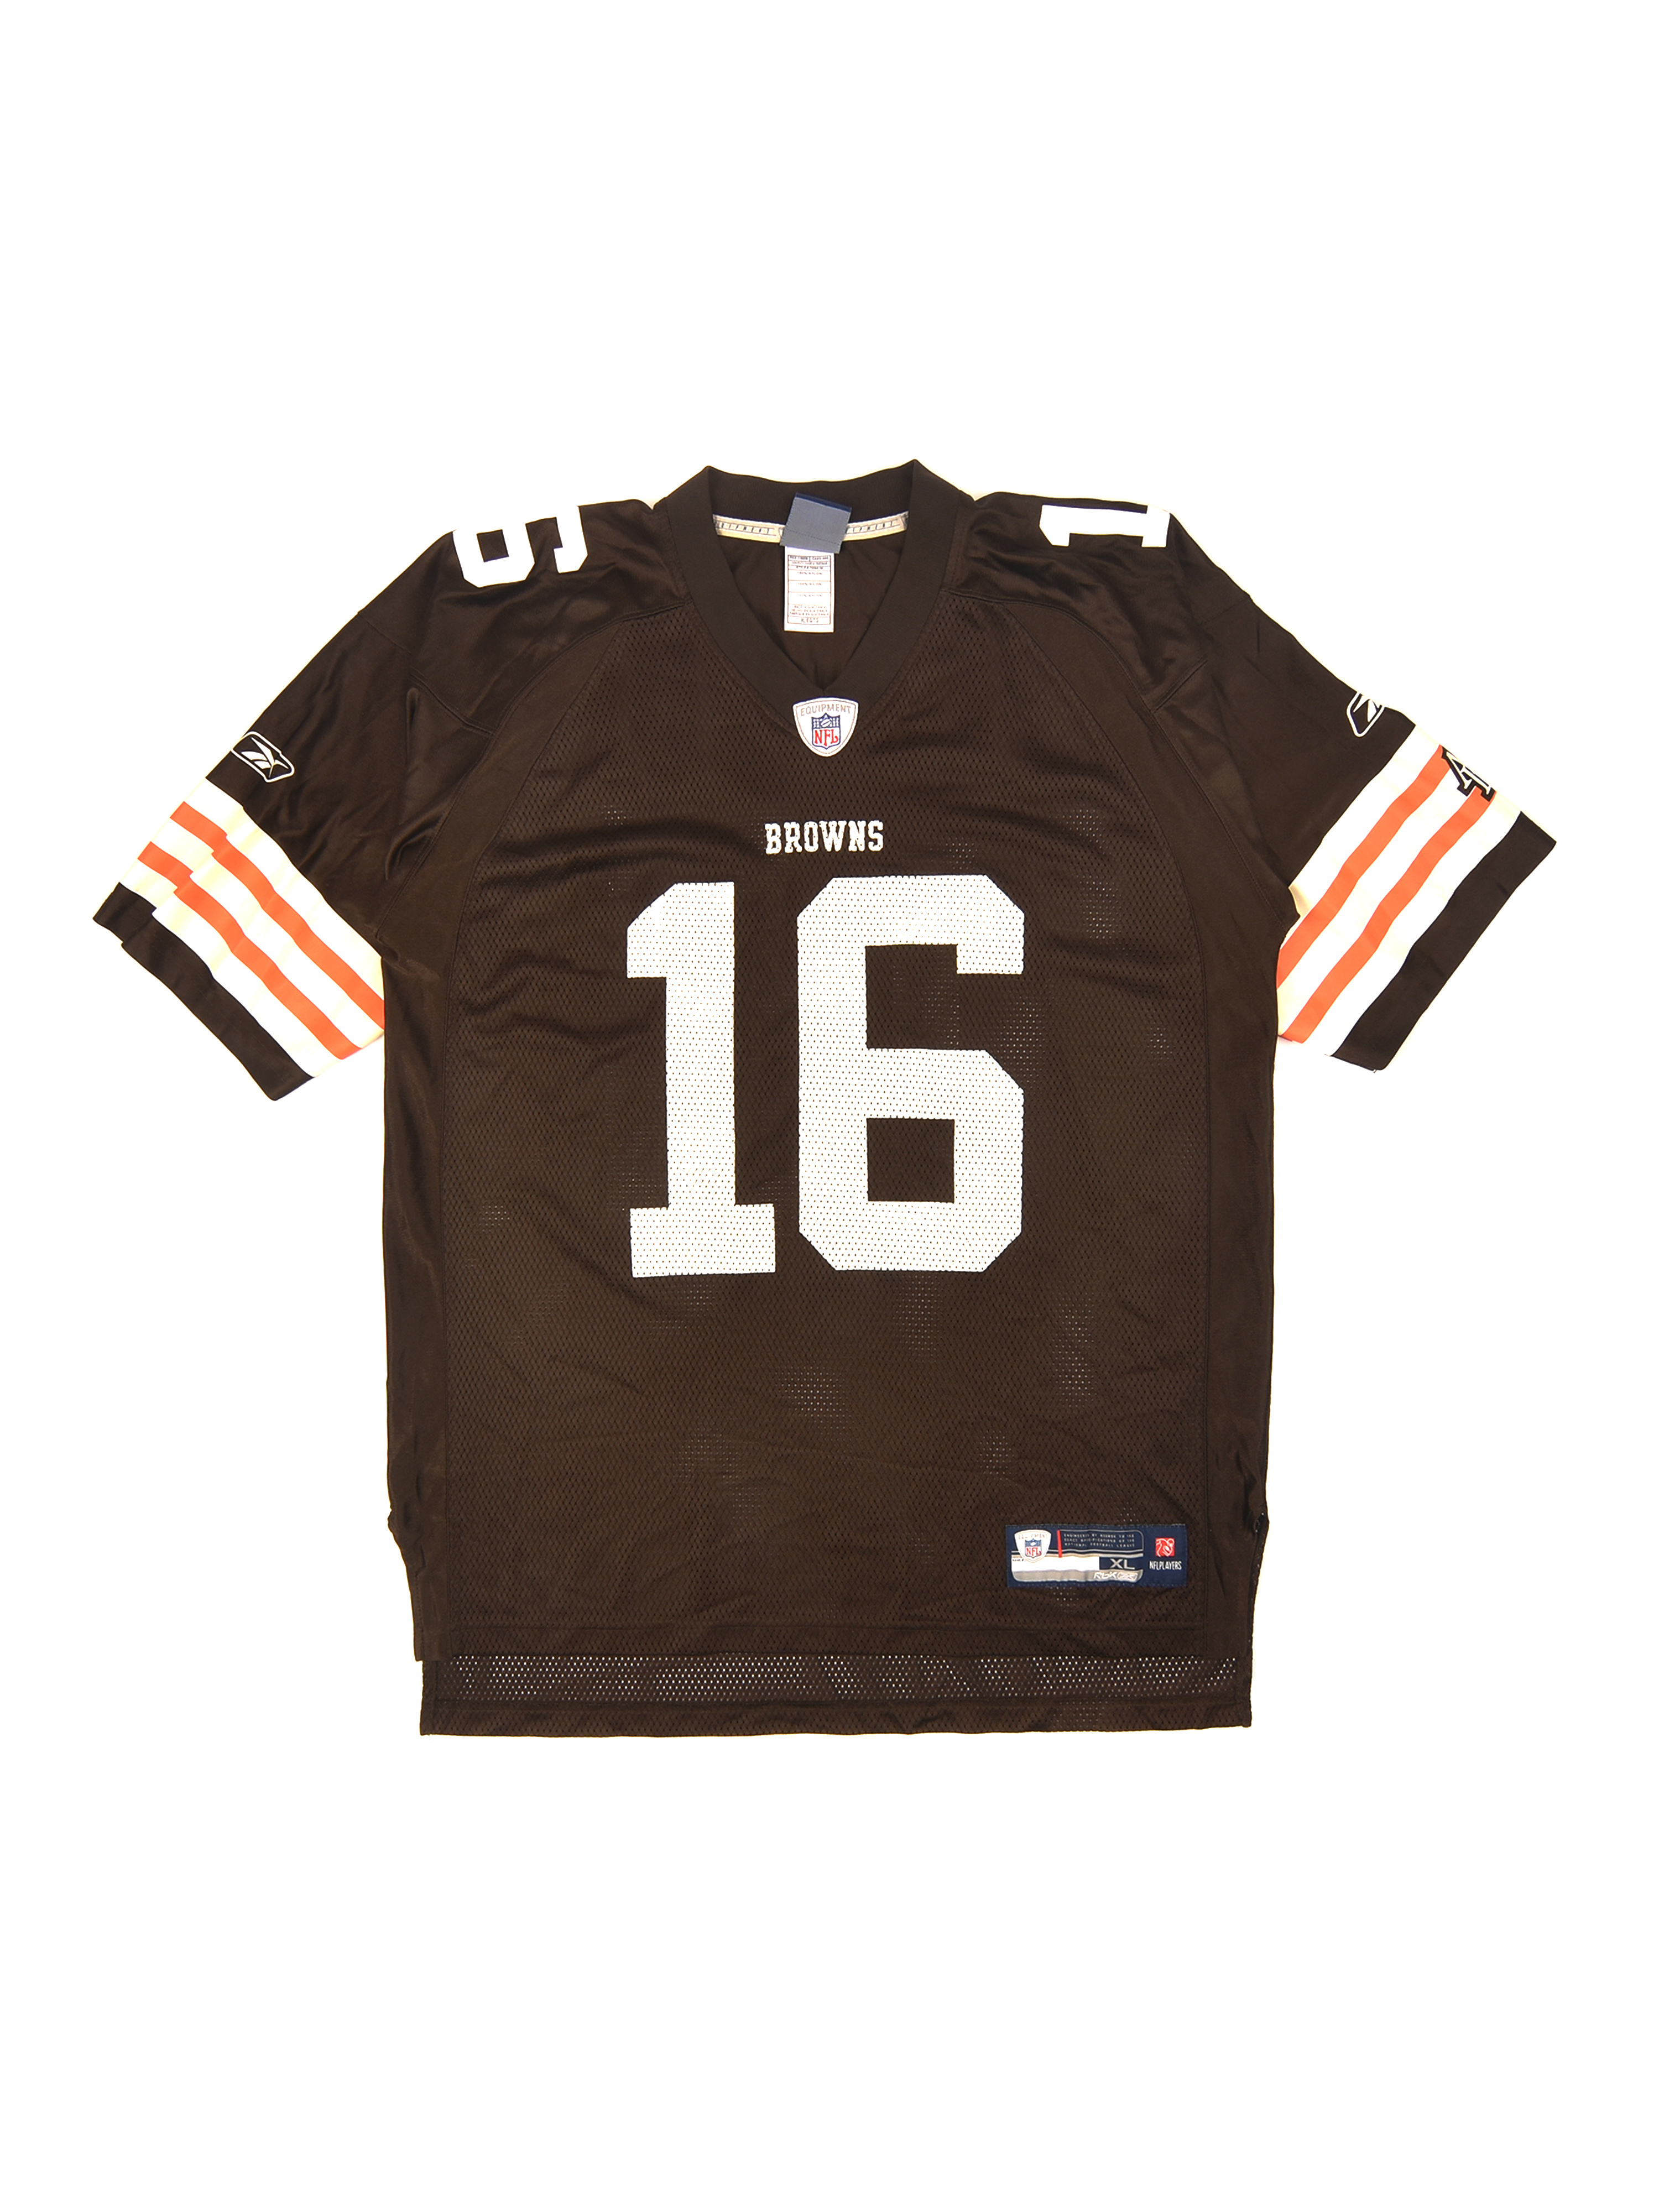 josh cribbs browns jersey